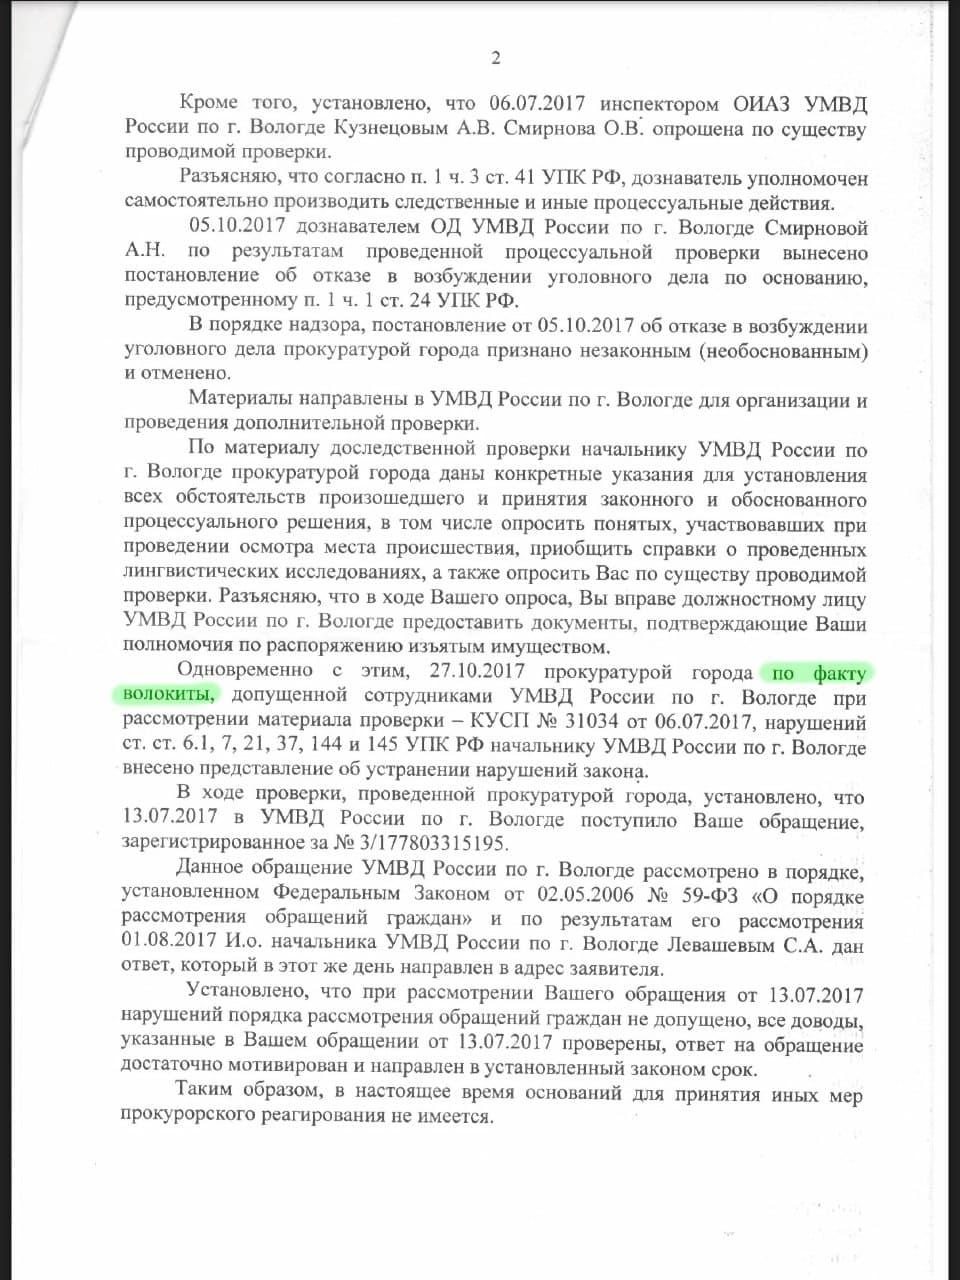 Генерал Виктор Пестерев. Вологда Белгород (5).jpg